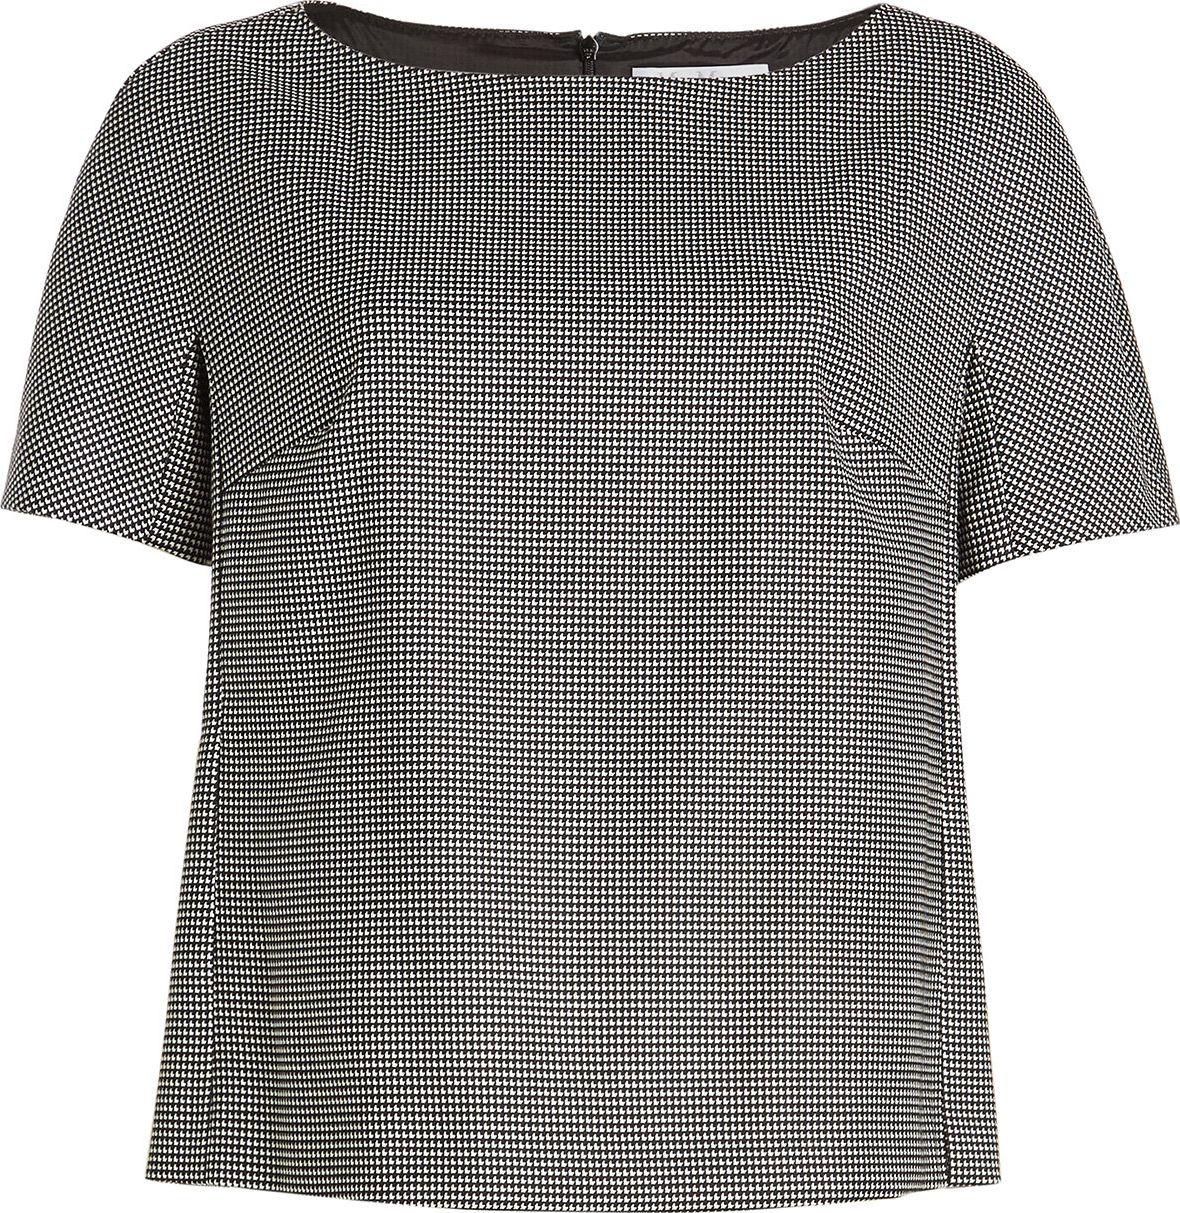 Max Mara - Printed Top with Wool